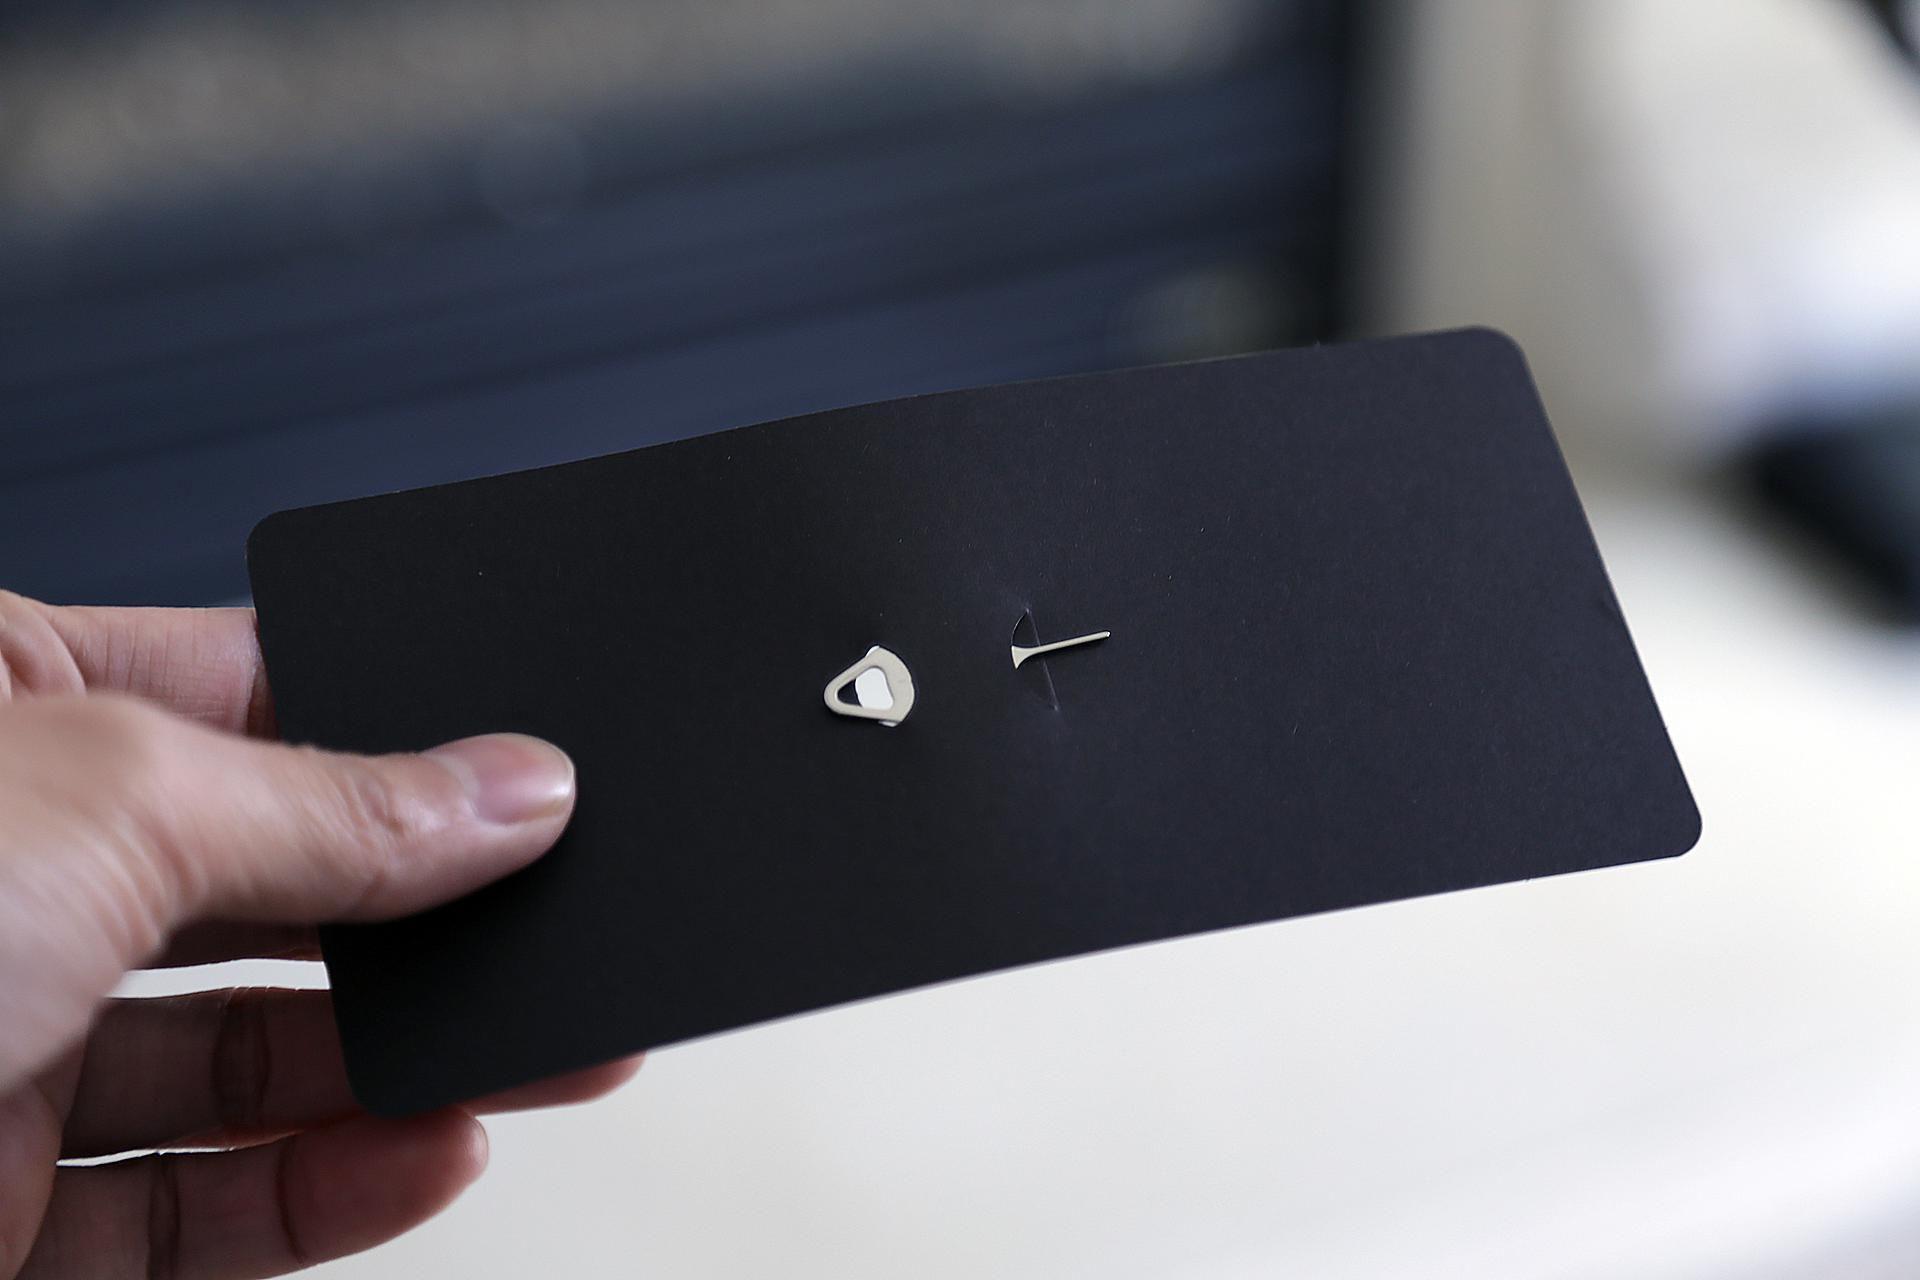 S7 Edge Sd Karte.Replacing Sim Memory Card Samsung Galaxy S7 Or Edge